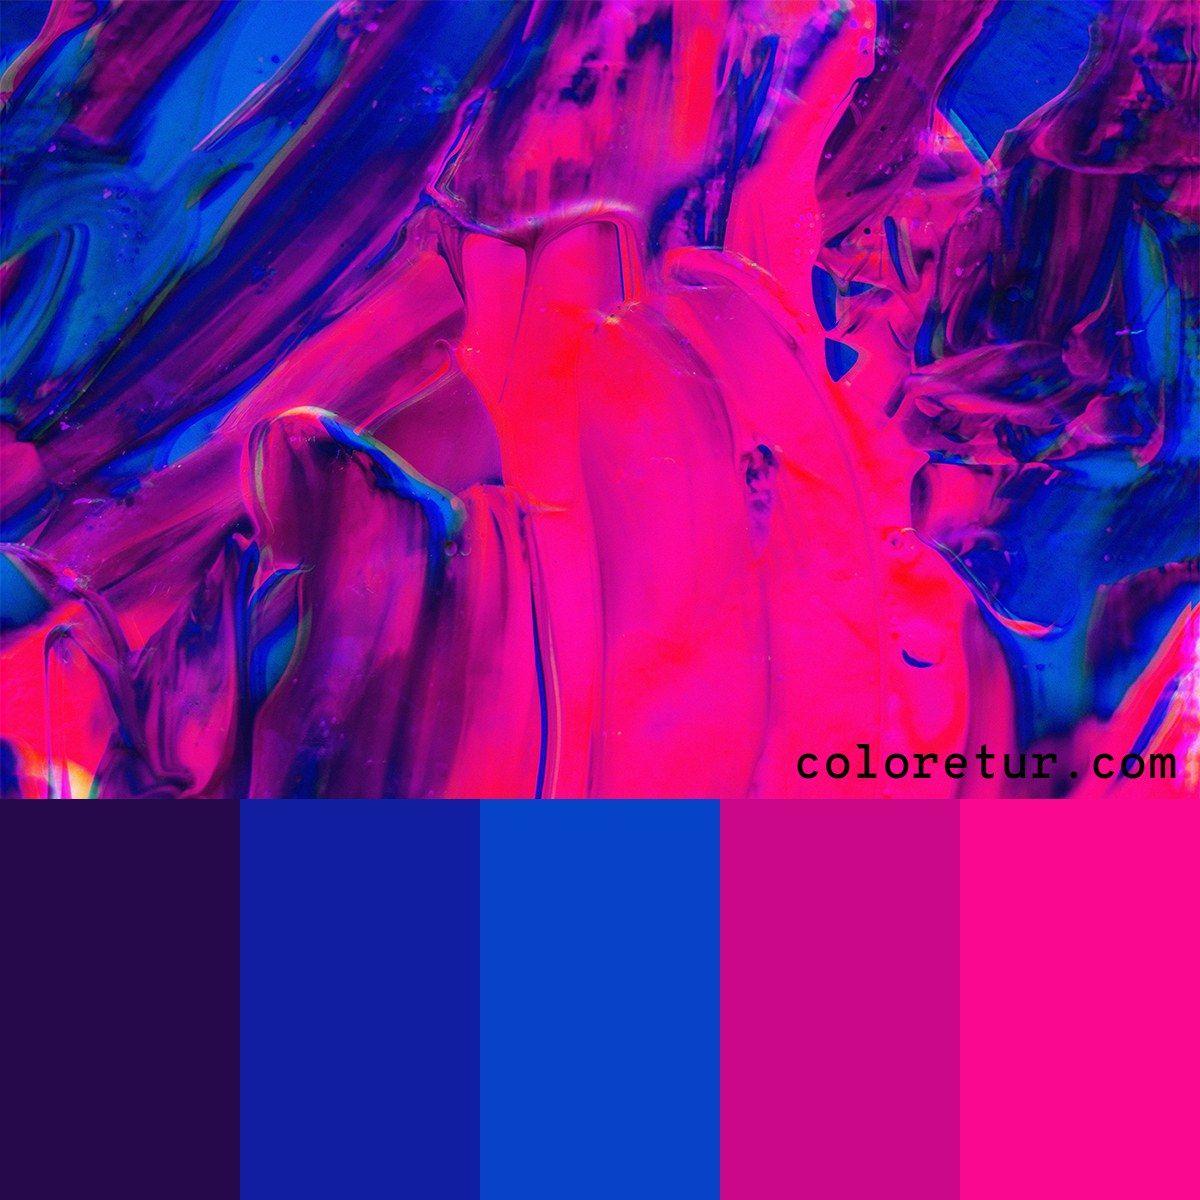 Neon Paint - Bright pink and blue swirls make this neon ...